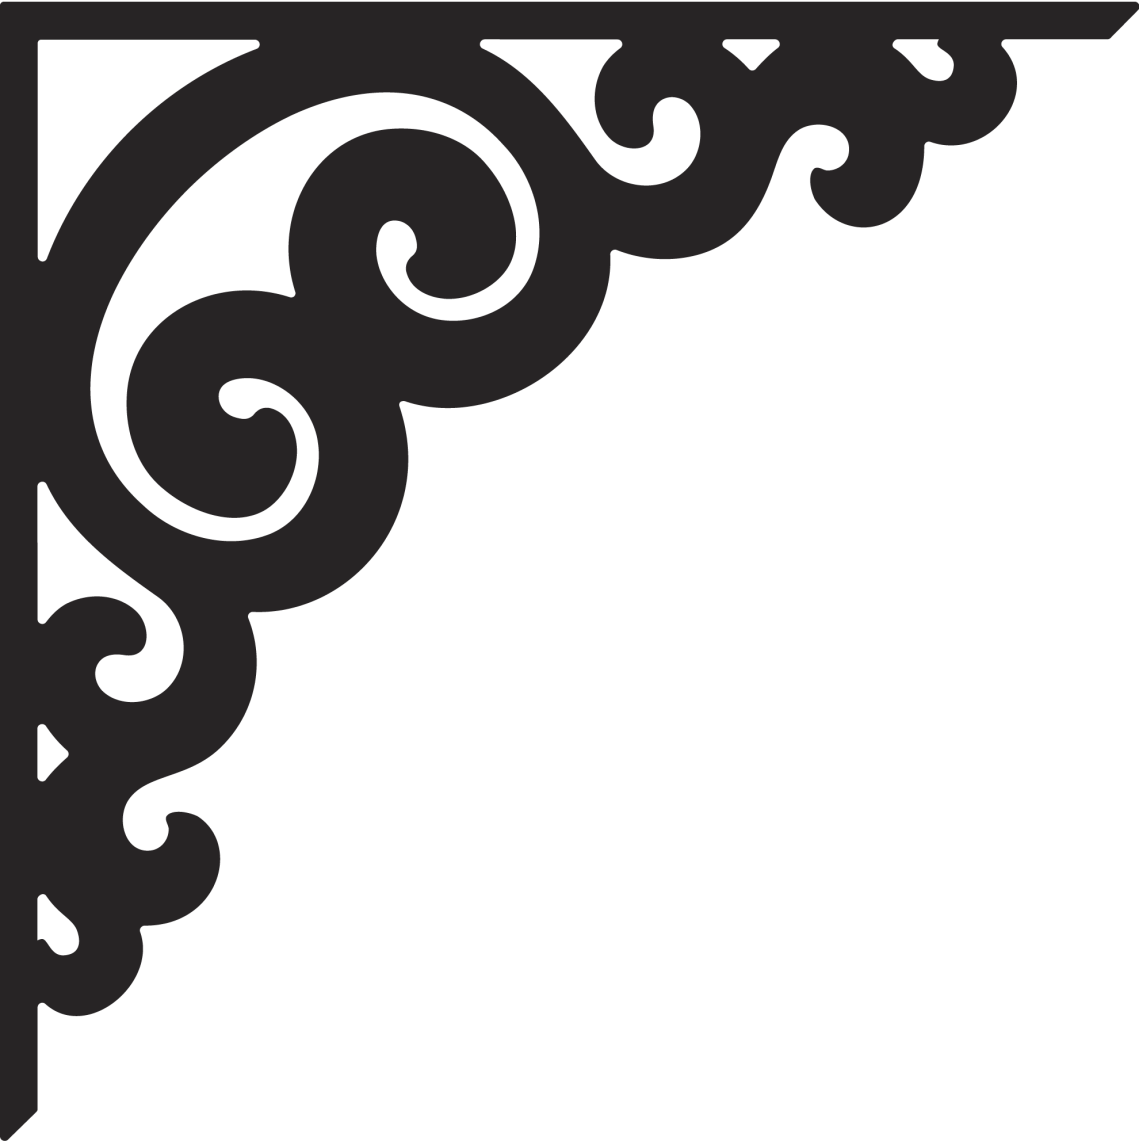 Download Corner clipart stencil, Corner stencil Transparent FREE ...